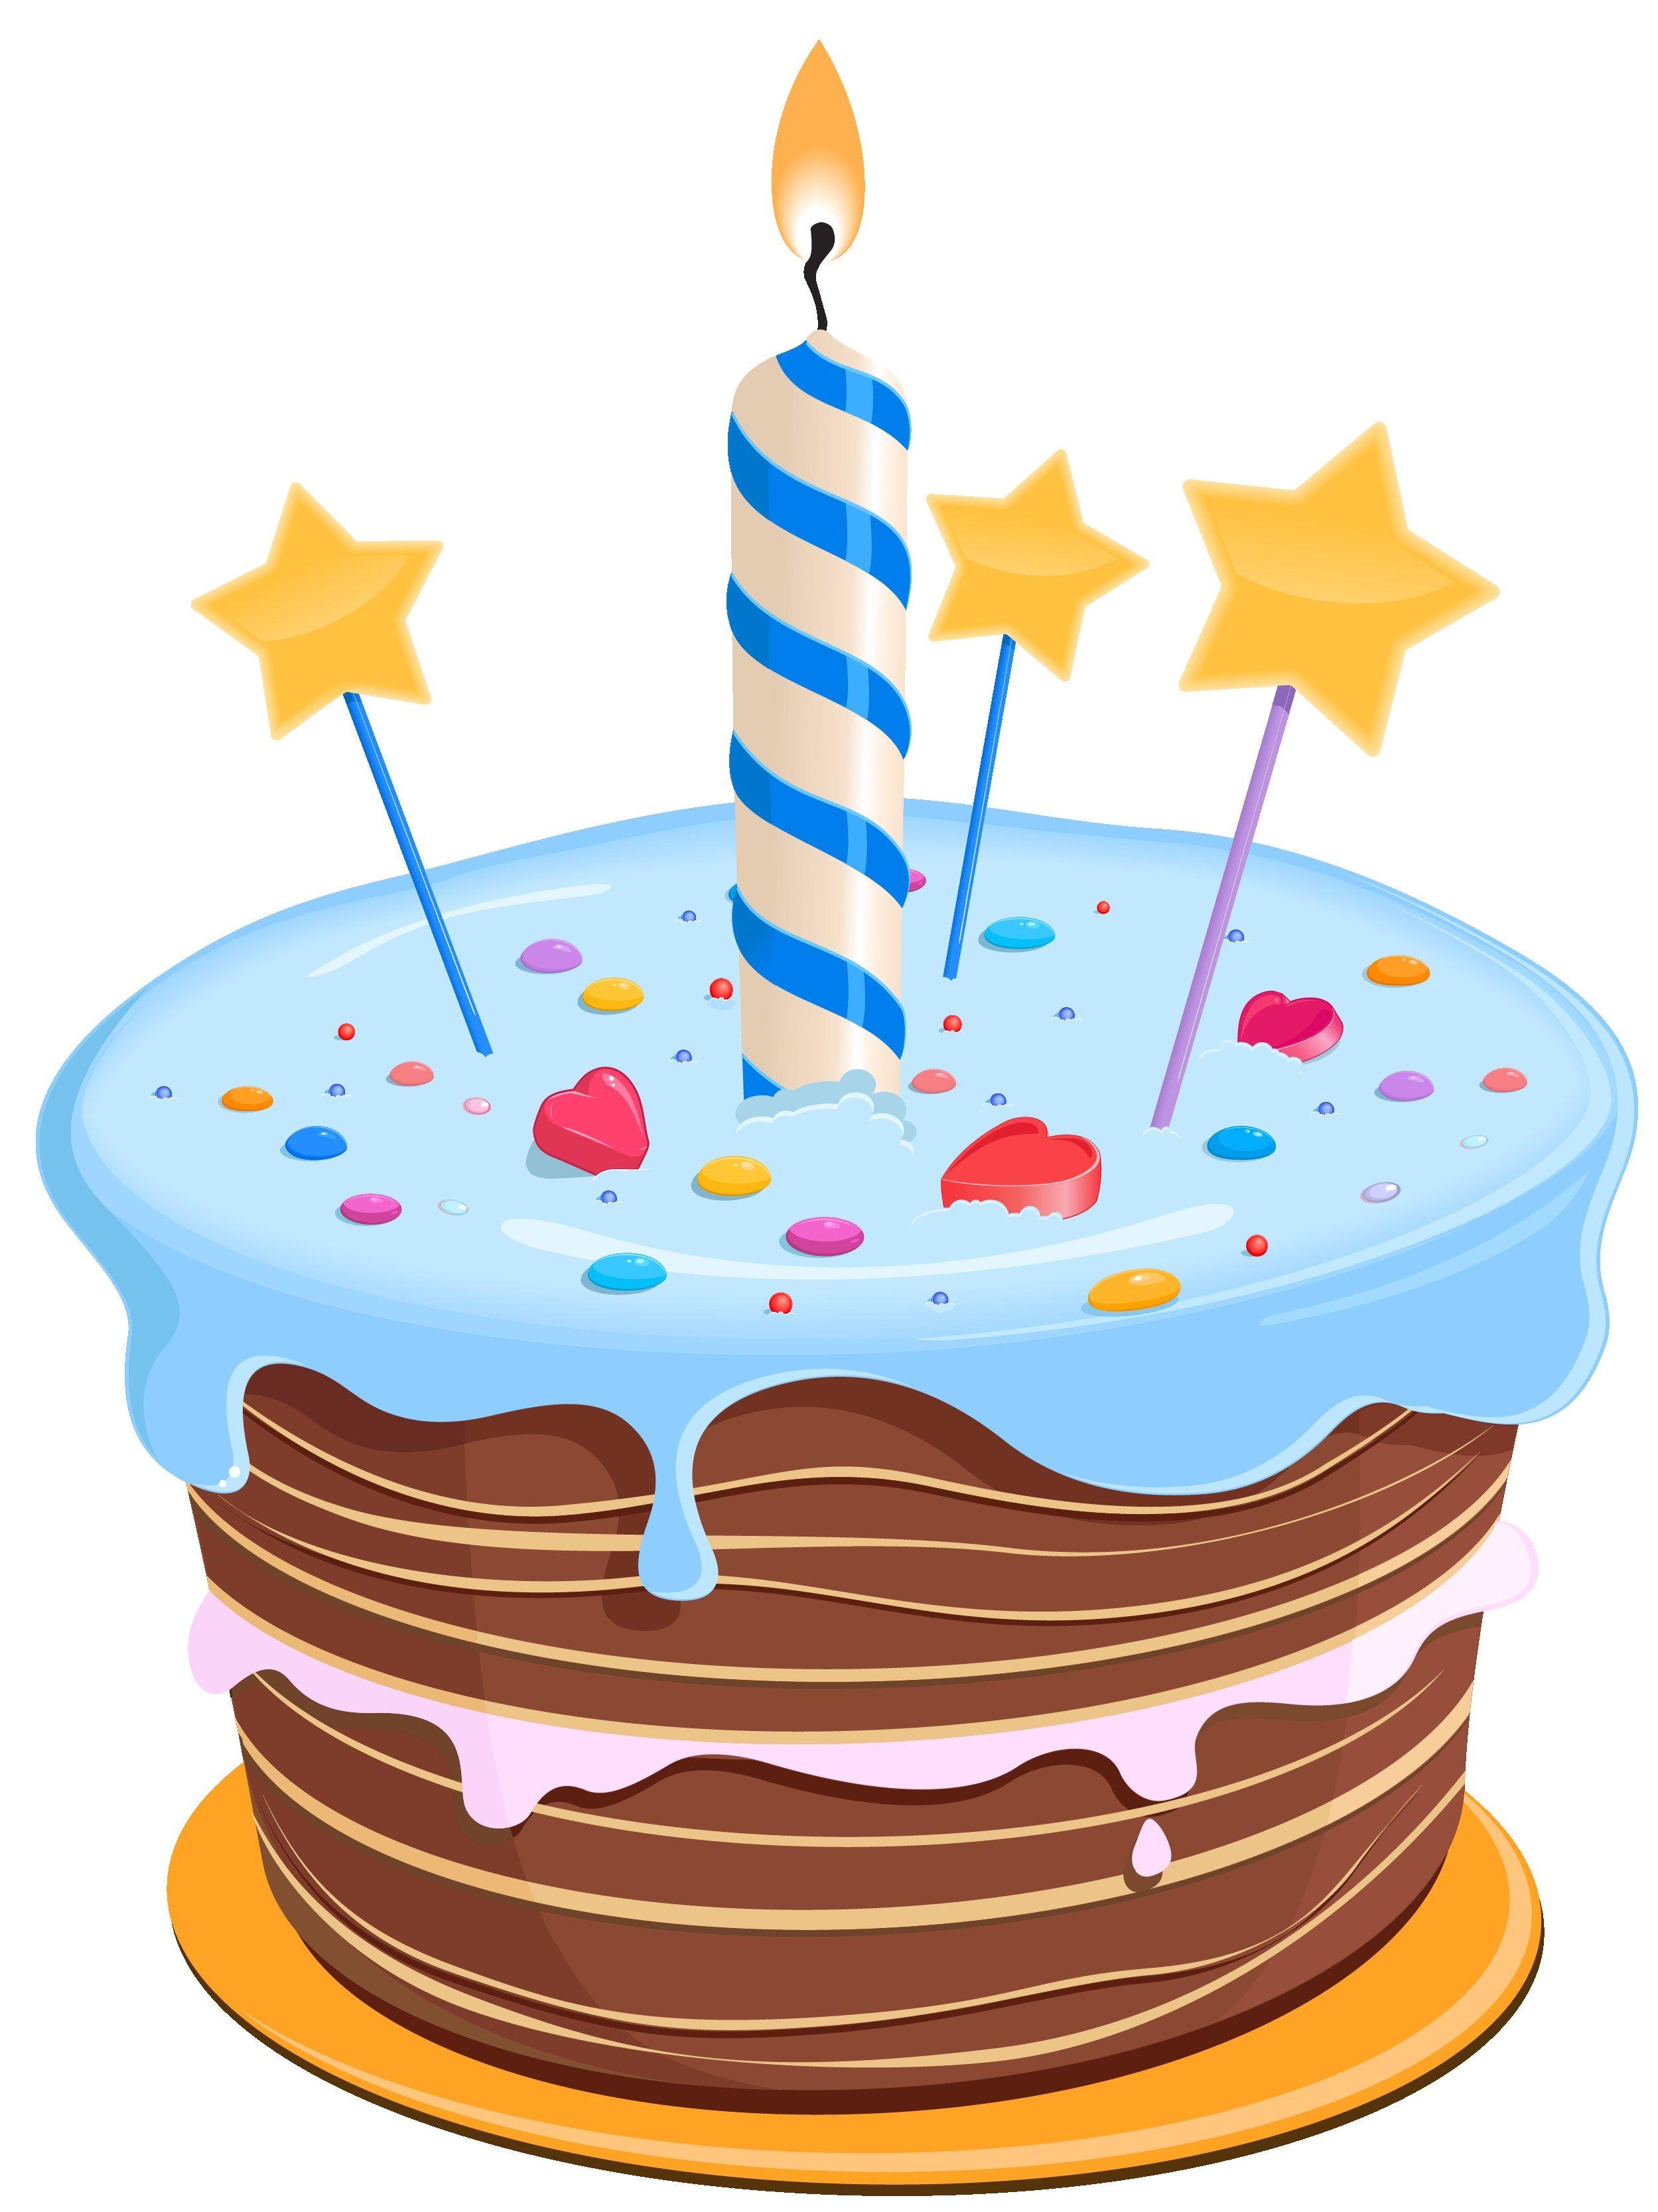 Remarkable 30 Amazing Photo Of Birthday Cake Emoticon Anniversaire Voeux Funny Birthday Cards Online Unhofree Goldxyz